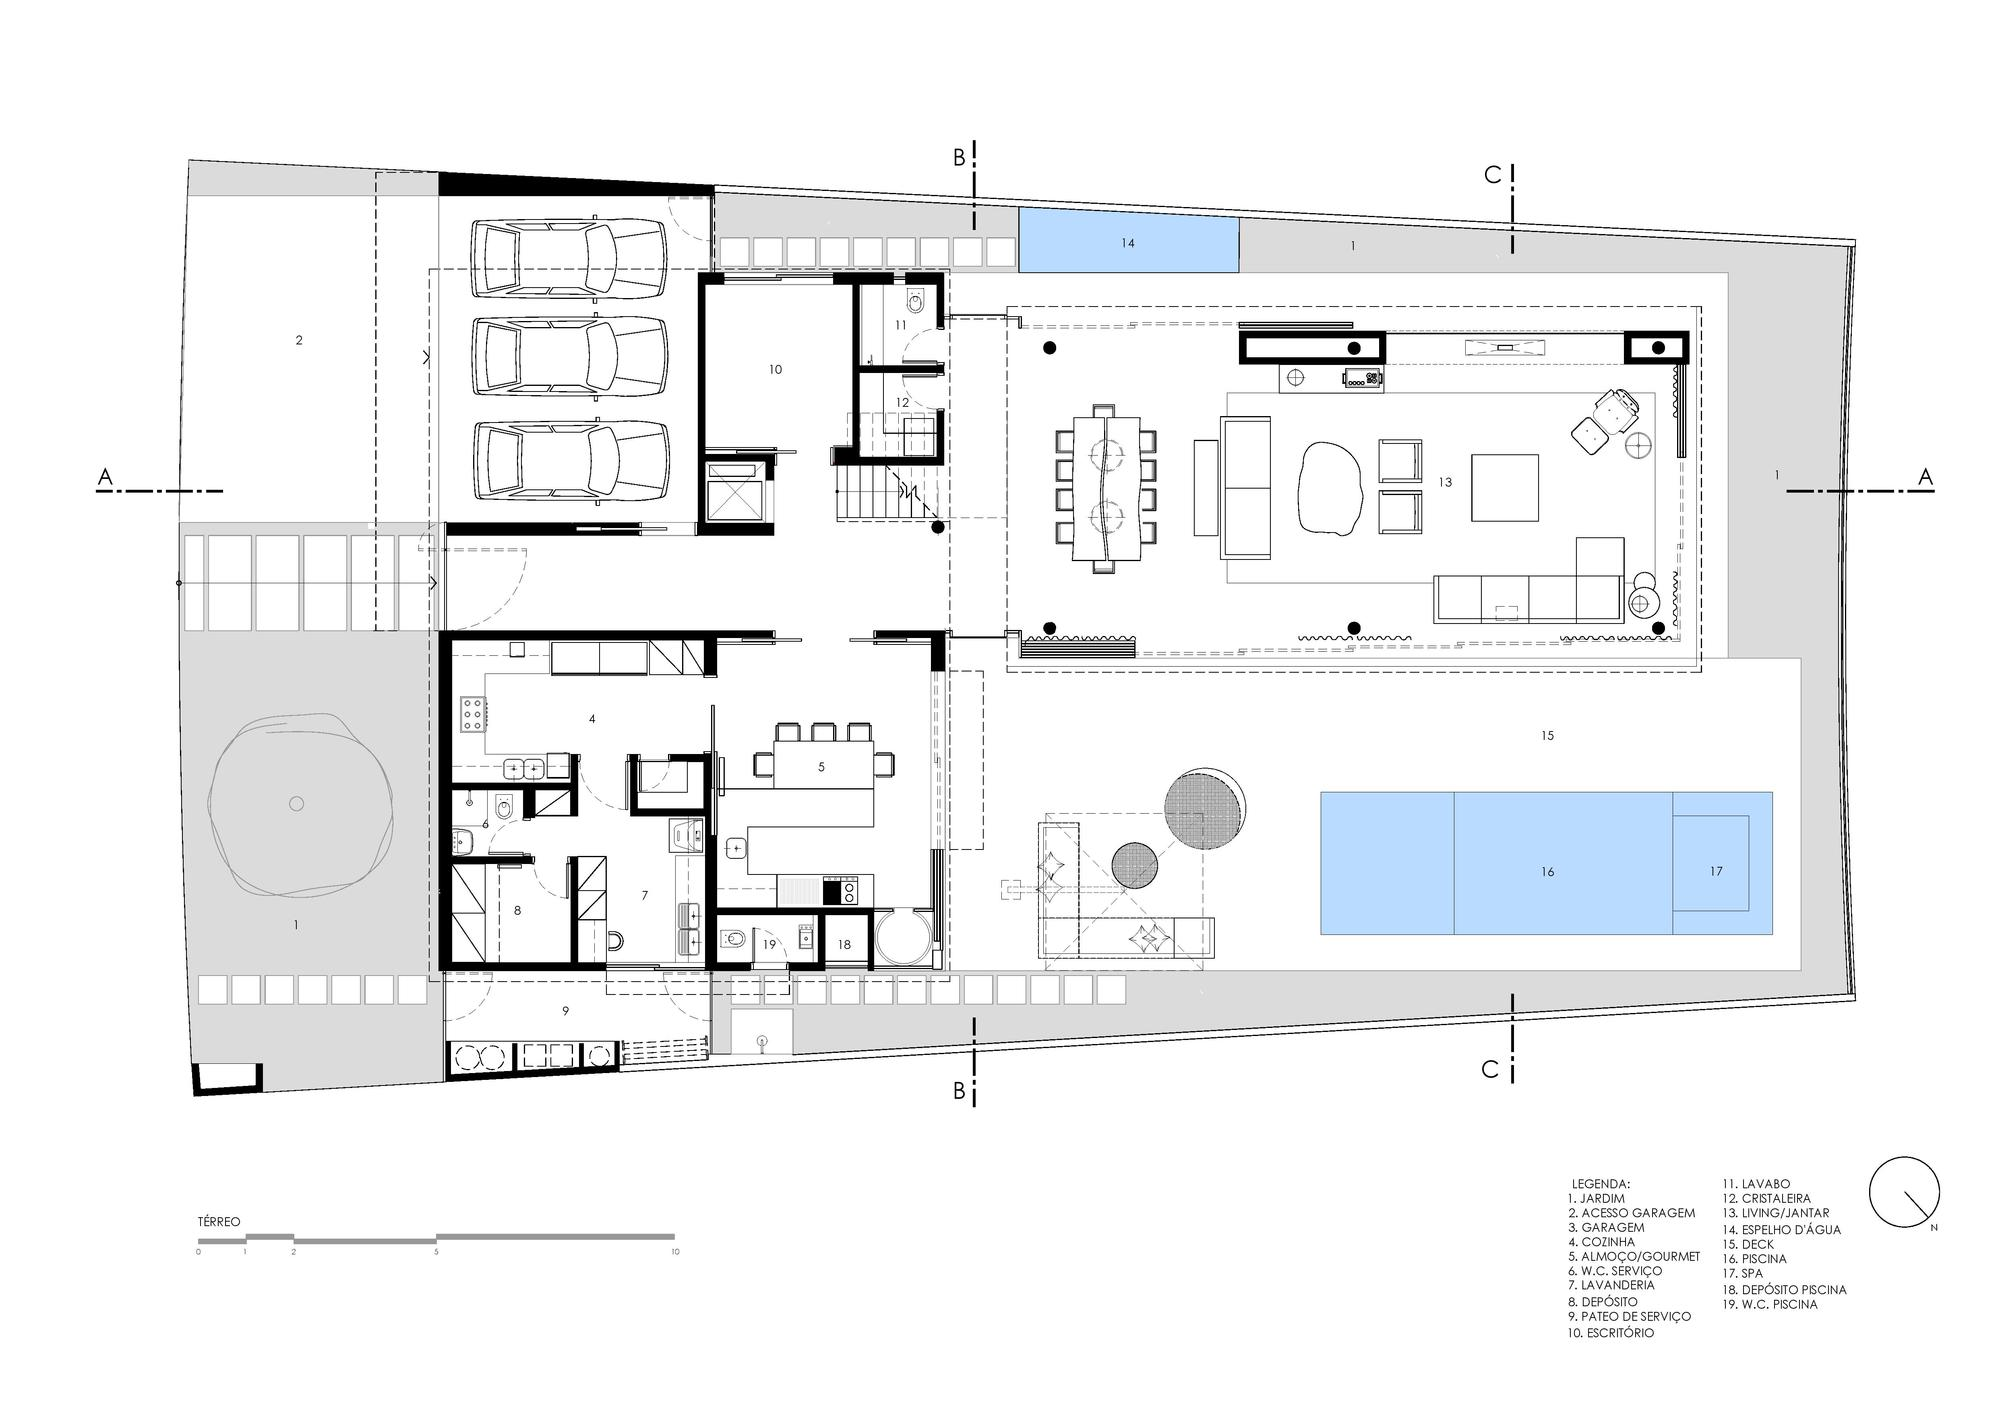 Galeria De Projeto Resid 234 Ncia Alphaville Mass